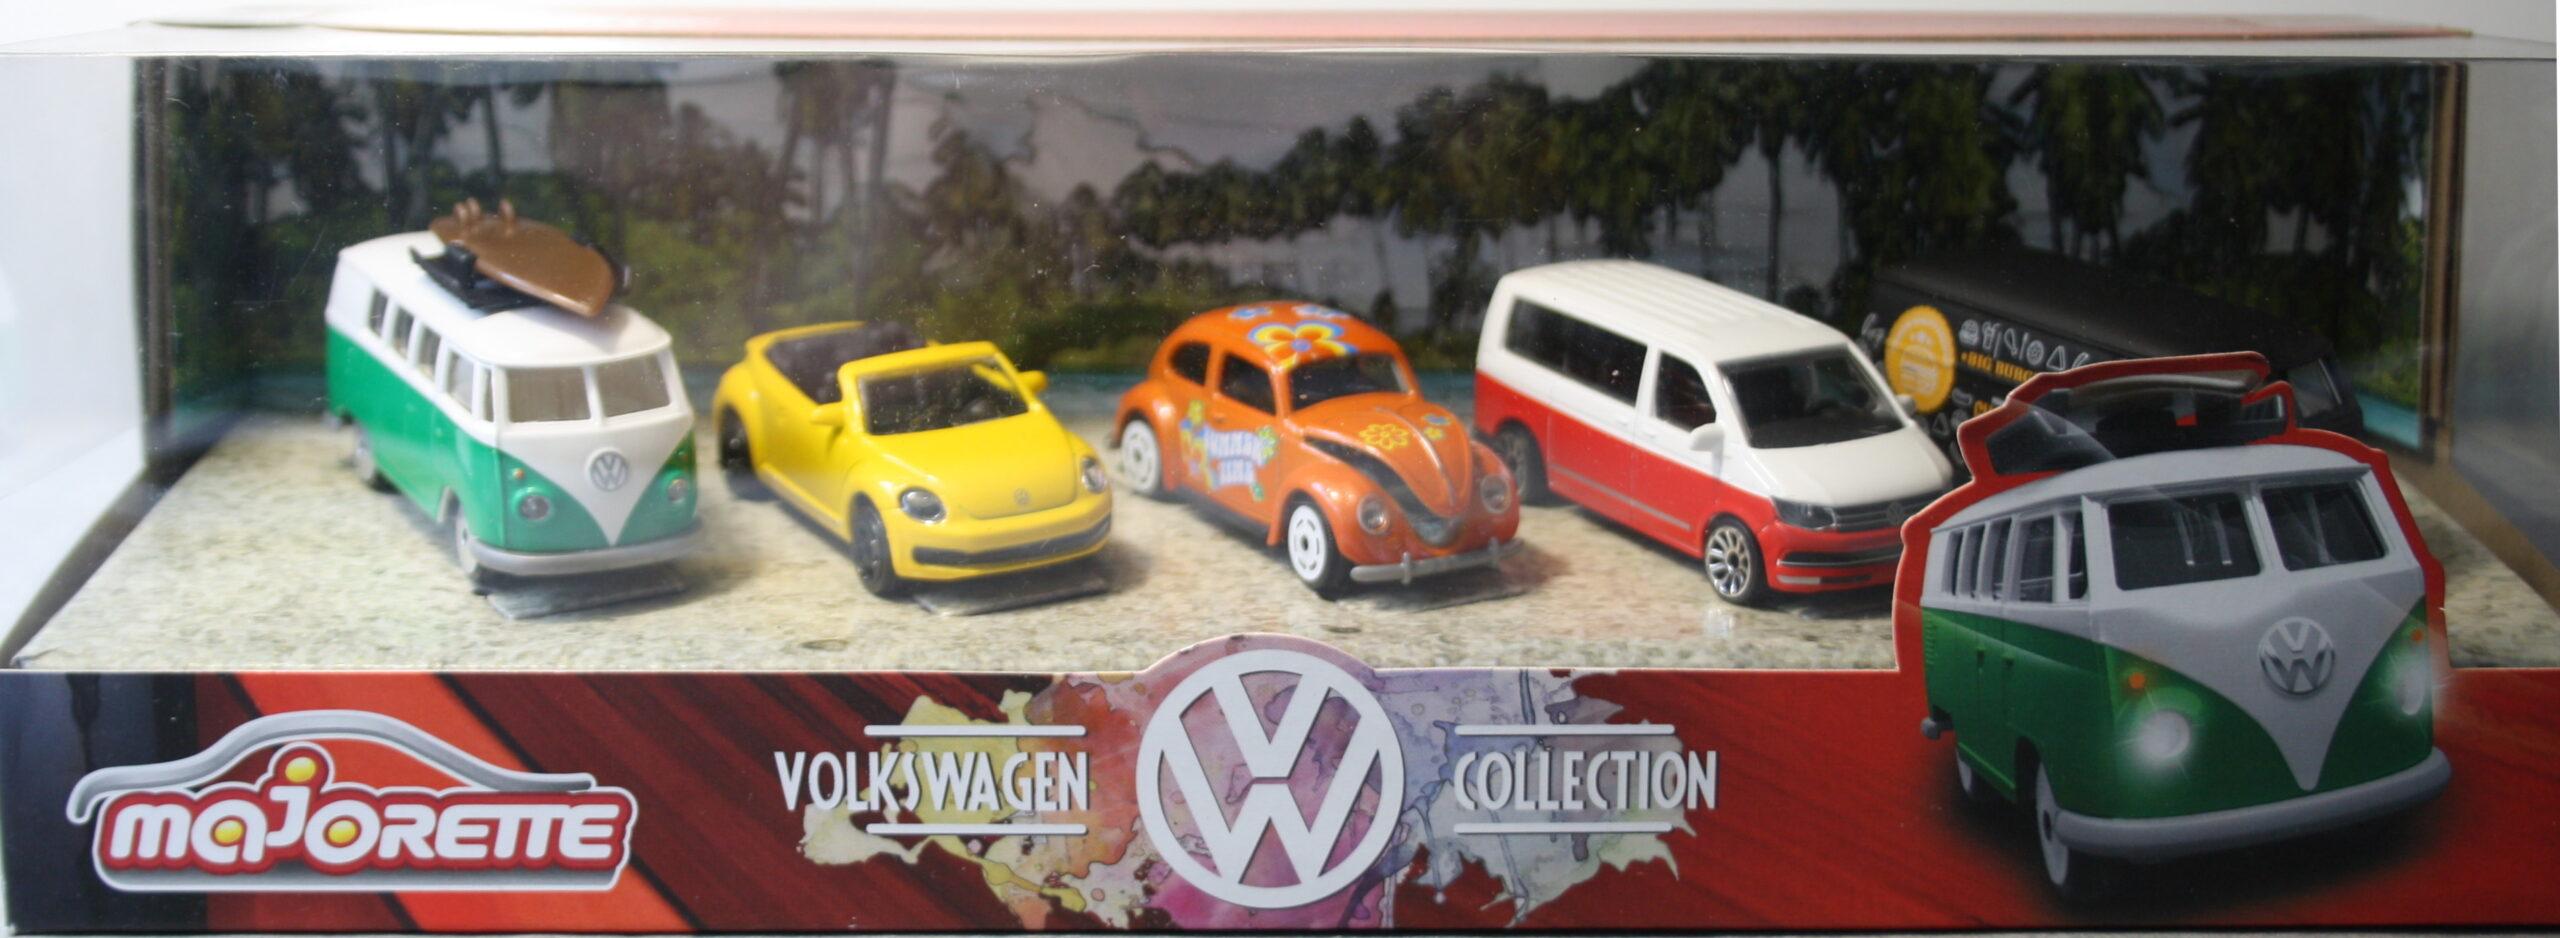 Volkswagen Collection    Majorette 1:64